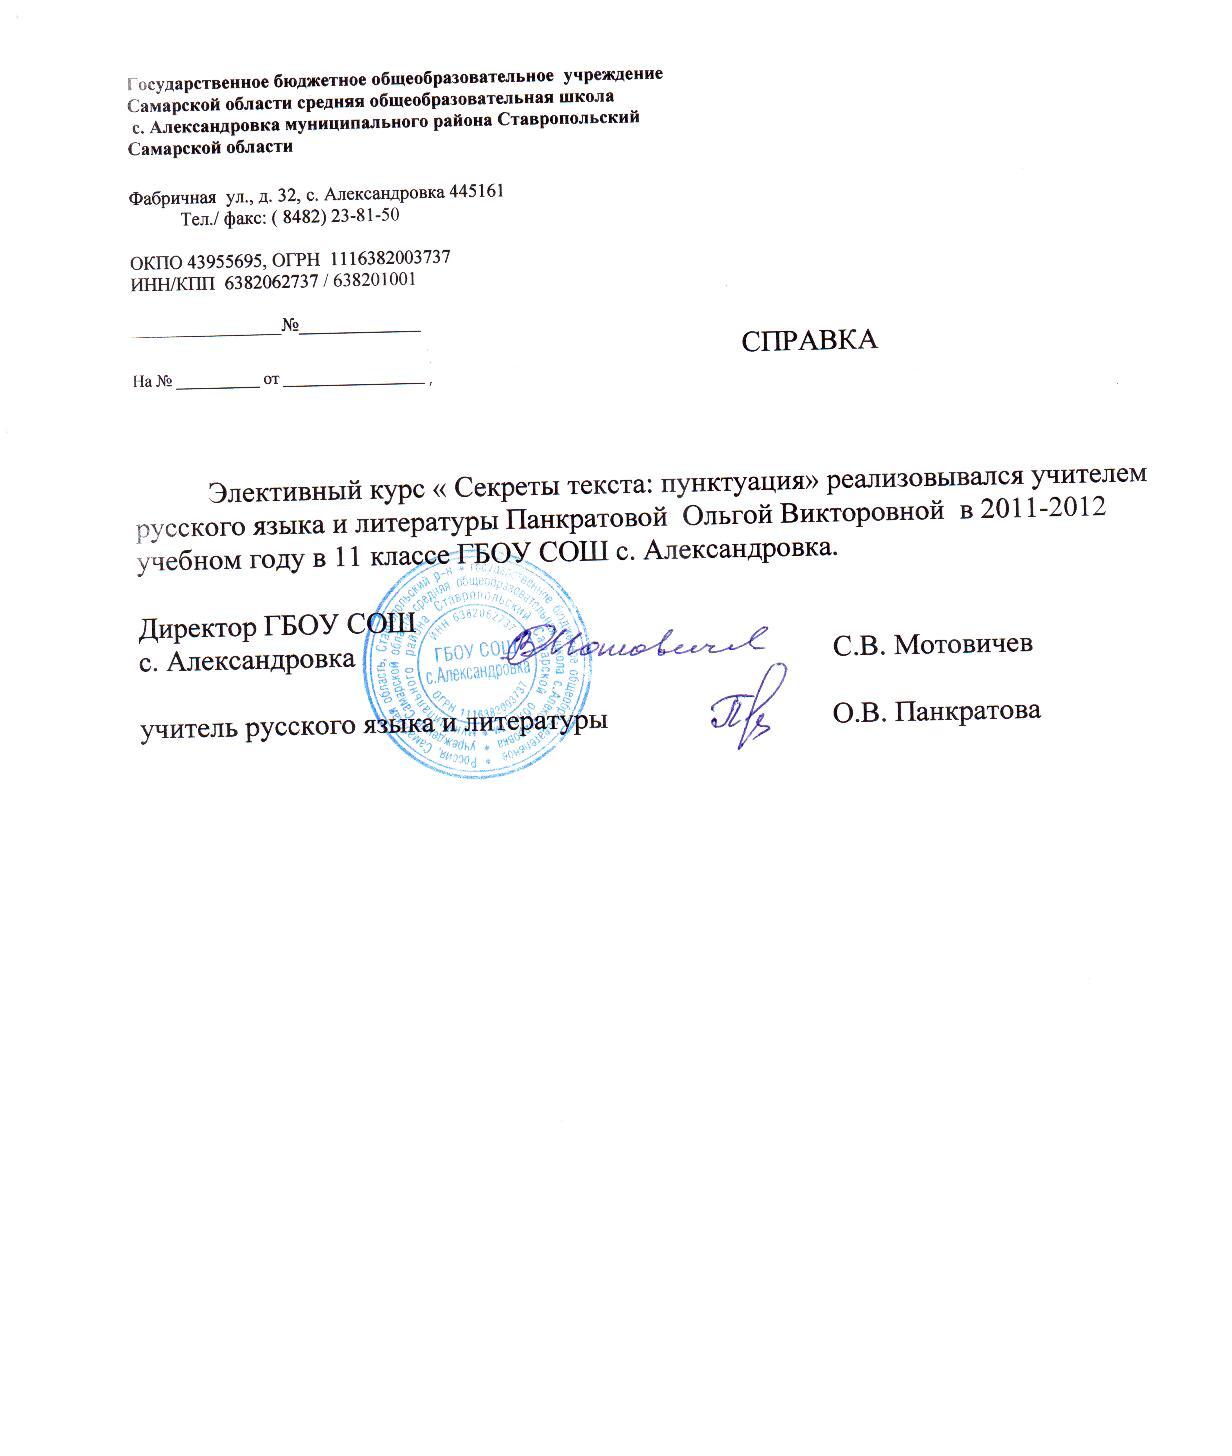 C:\Documents and Settings\Учитель\Рабочий стол\ов\справка.jpg